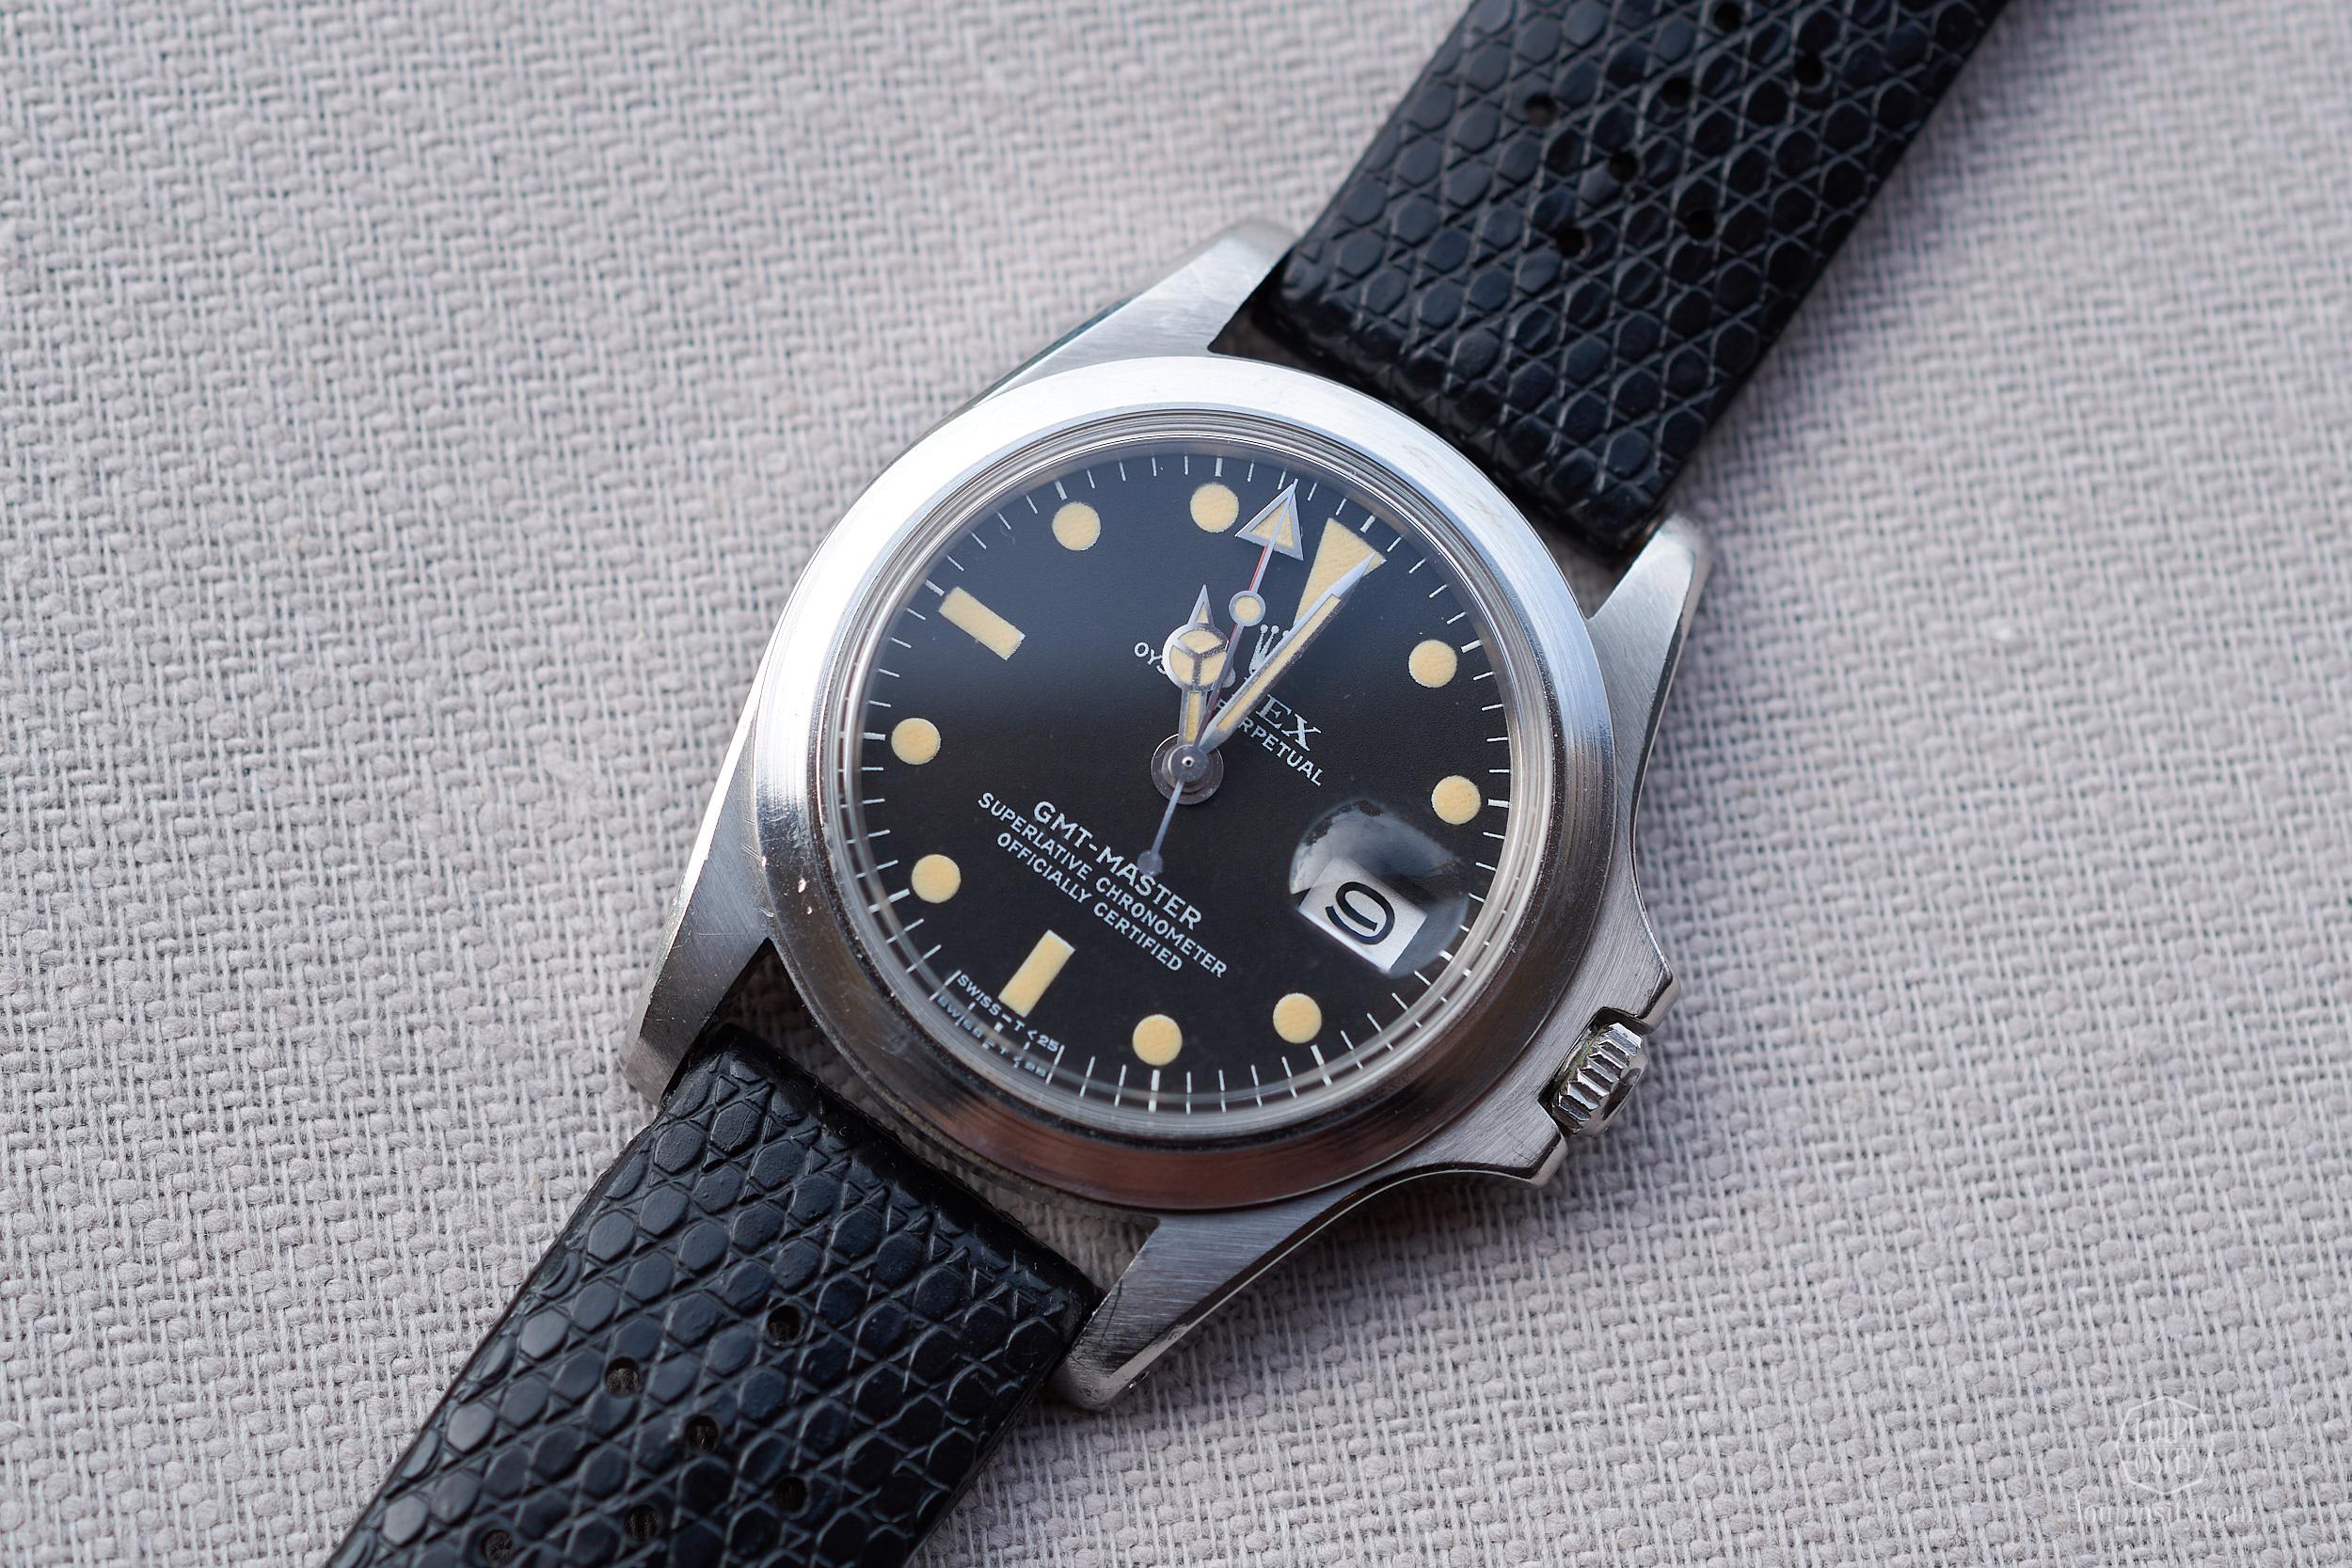 Lot 30 Rolex GMT-Master